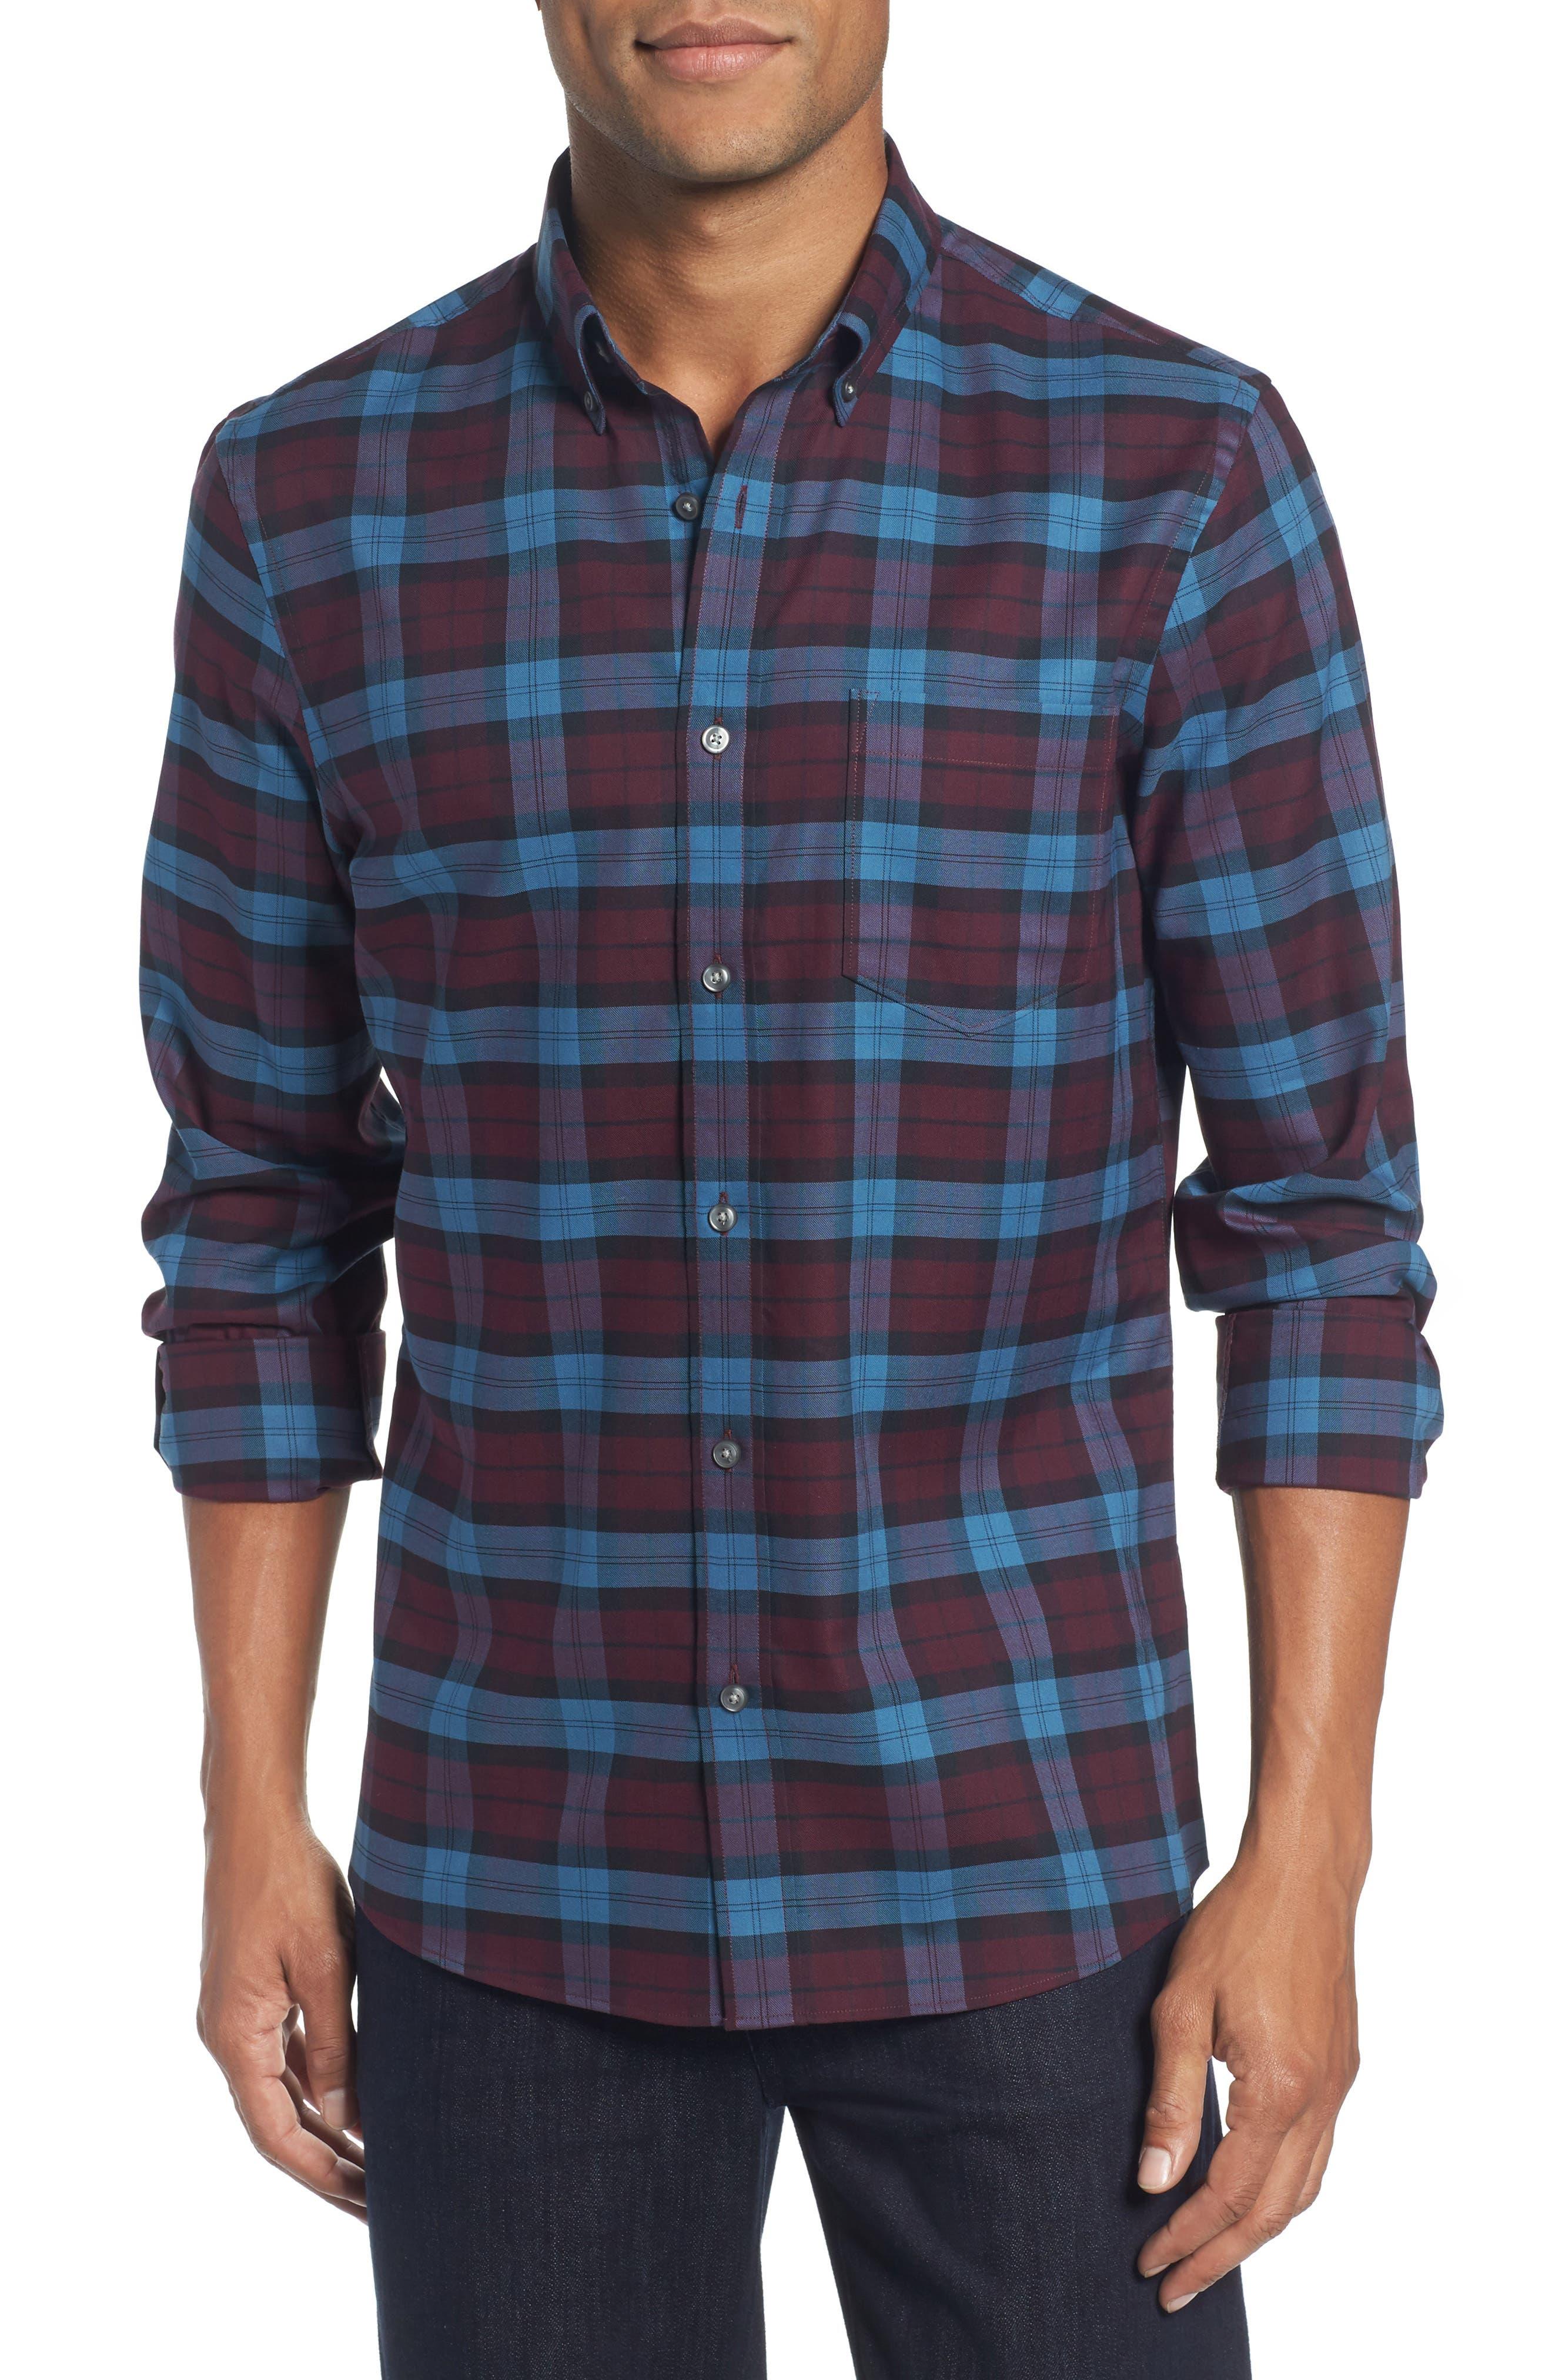 Alternate Image 1 Selected - Nordstrom Men's Shop Tech-Smart Slim Fit Plaid Sport Shirt